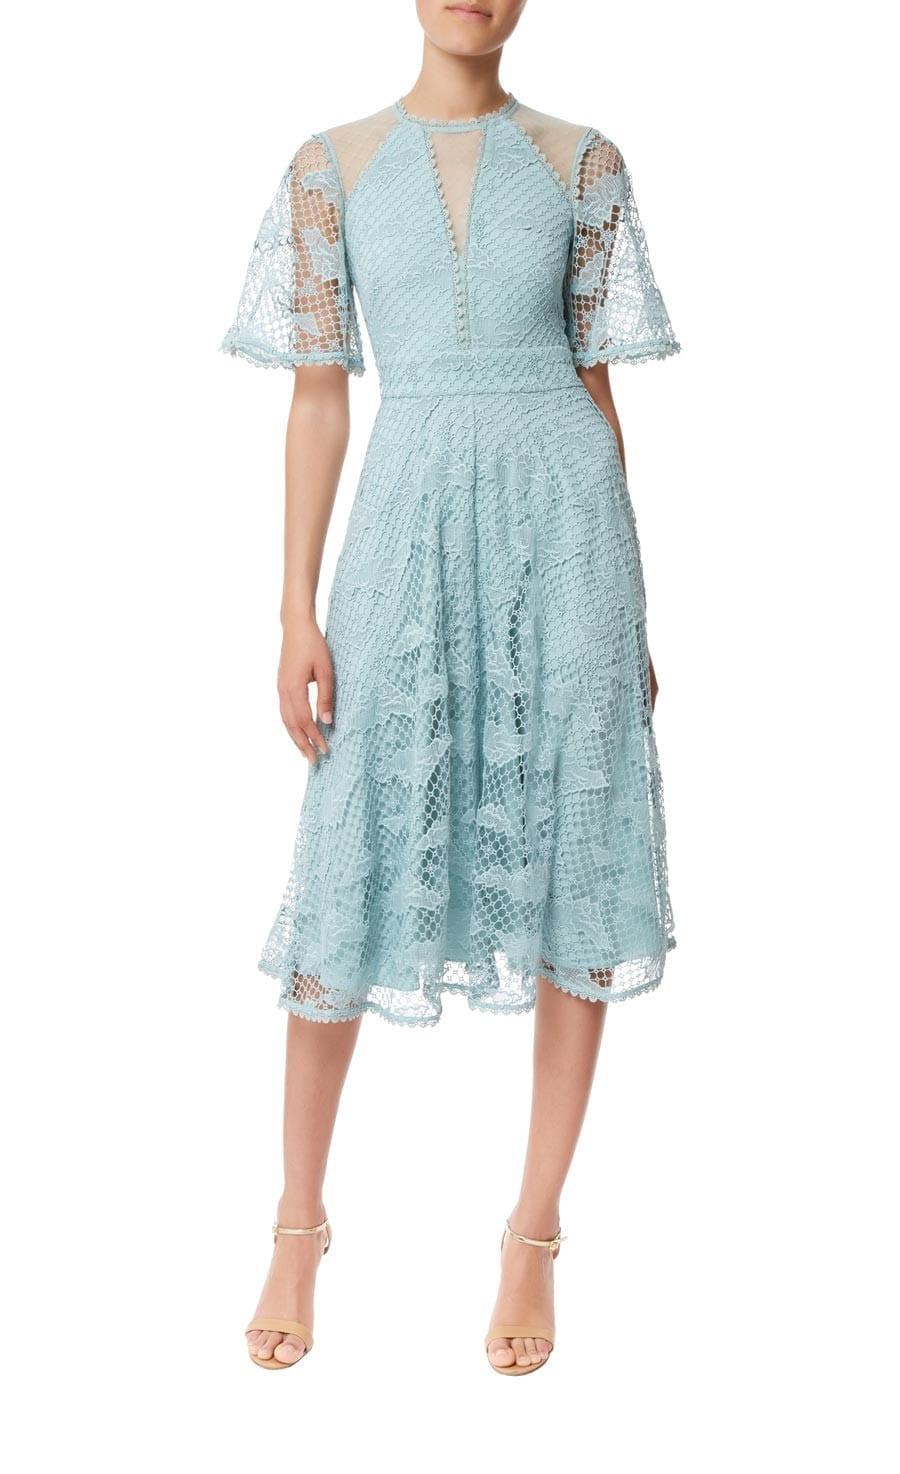 TEMPERLEY LONDON Haze Lace Sleeved Blue Dress